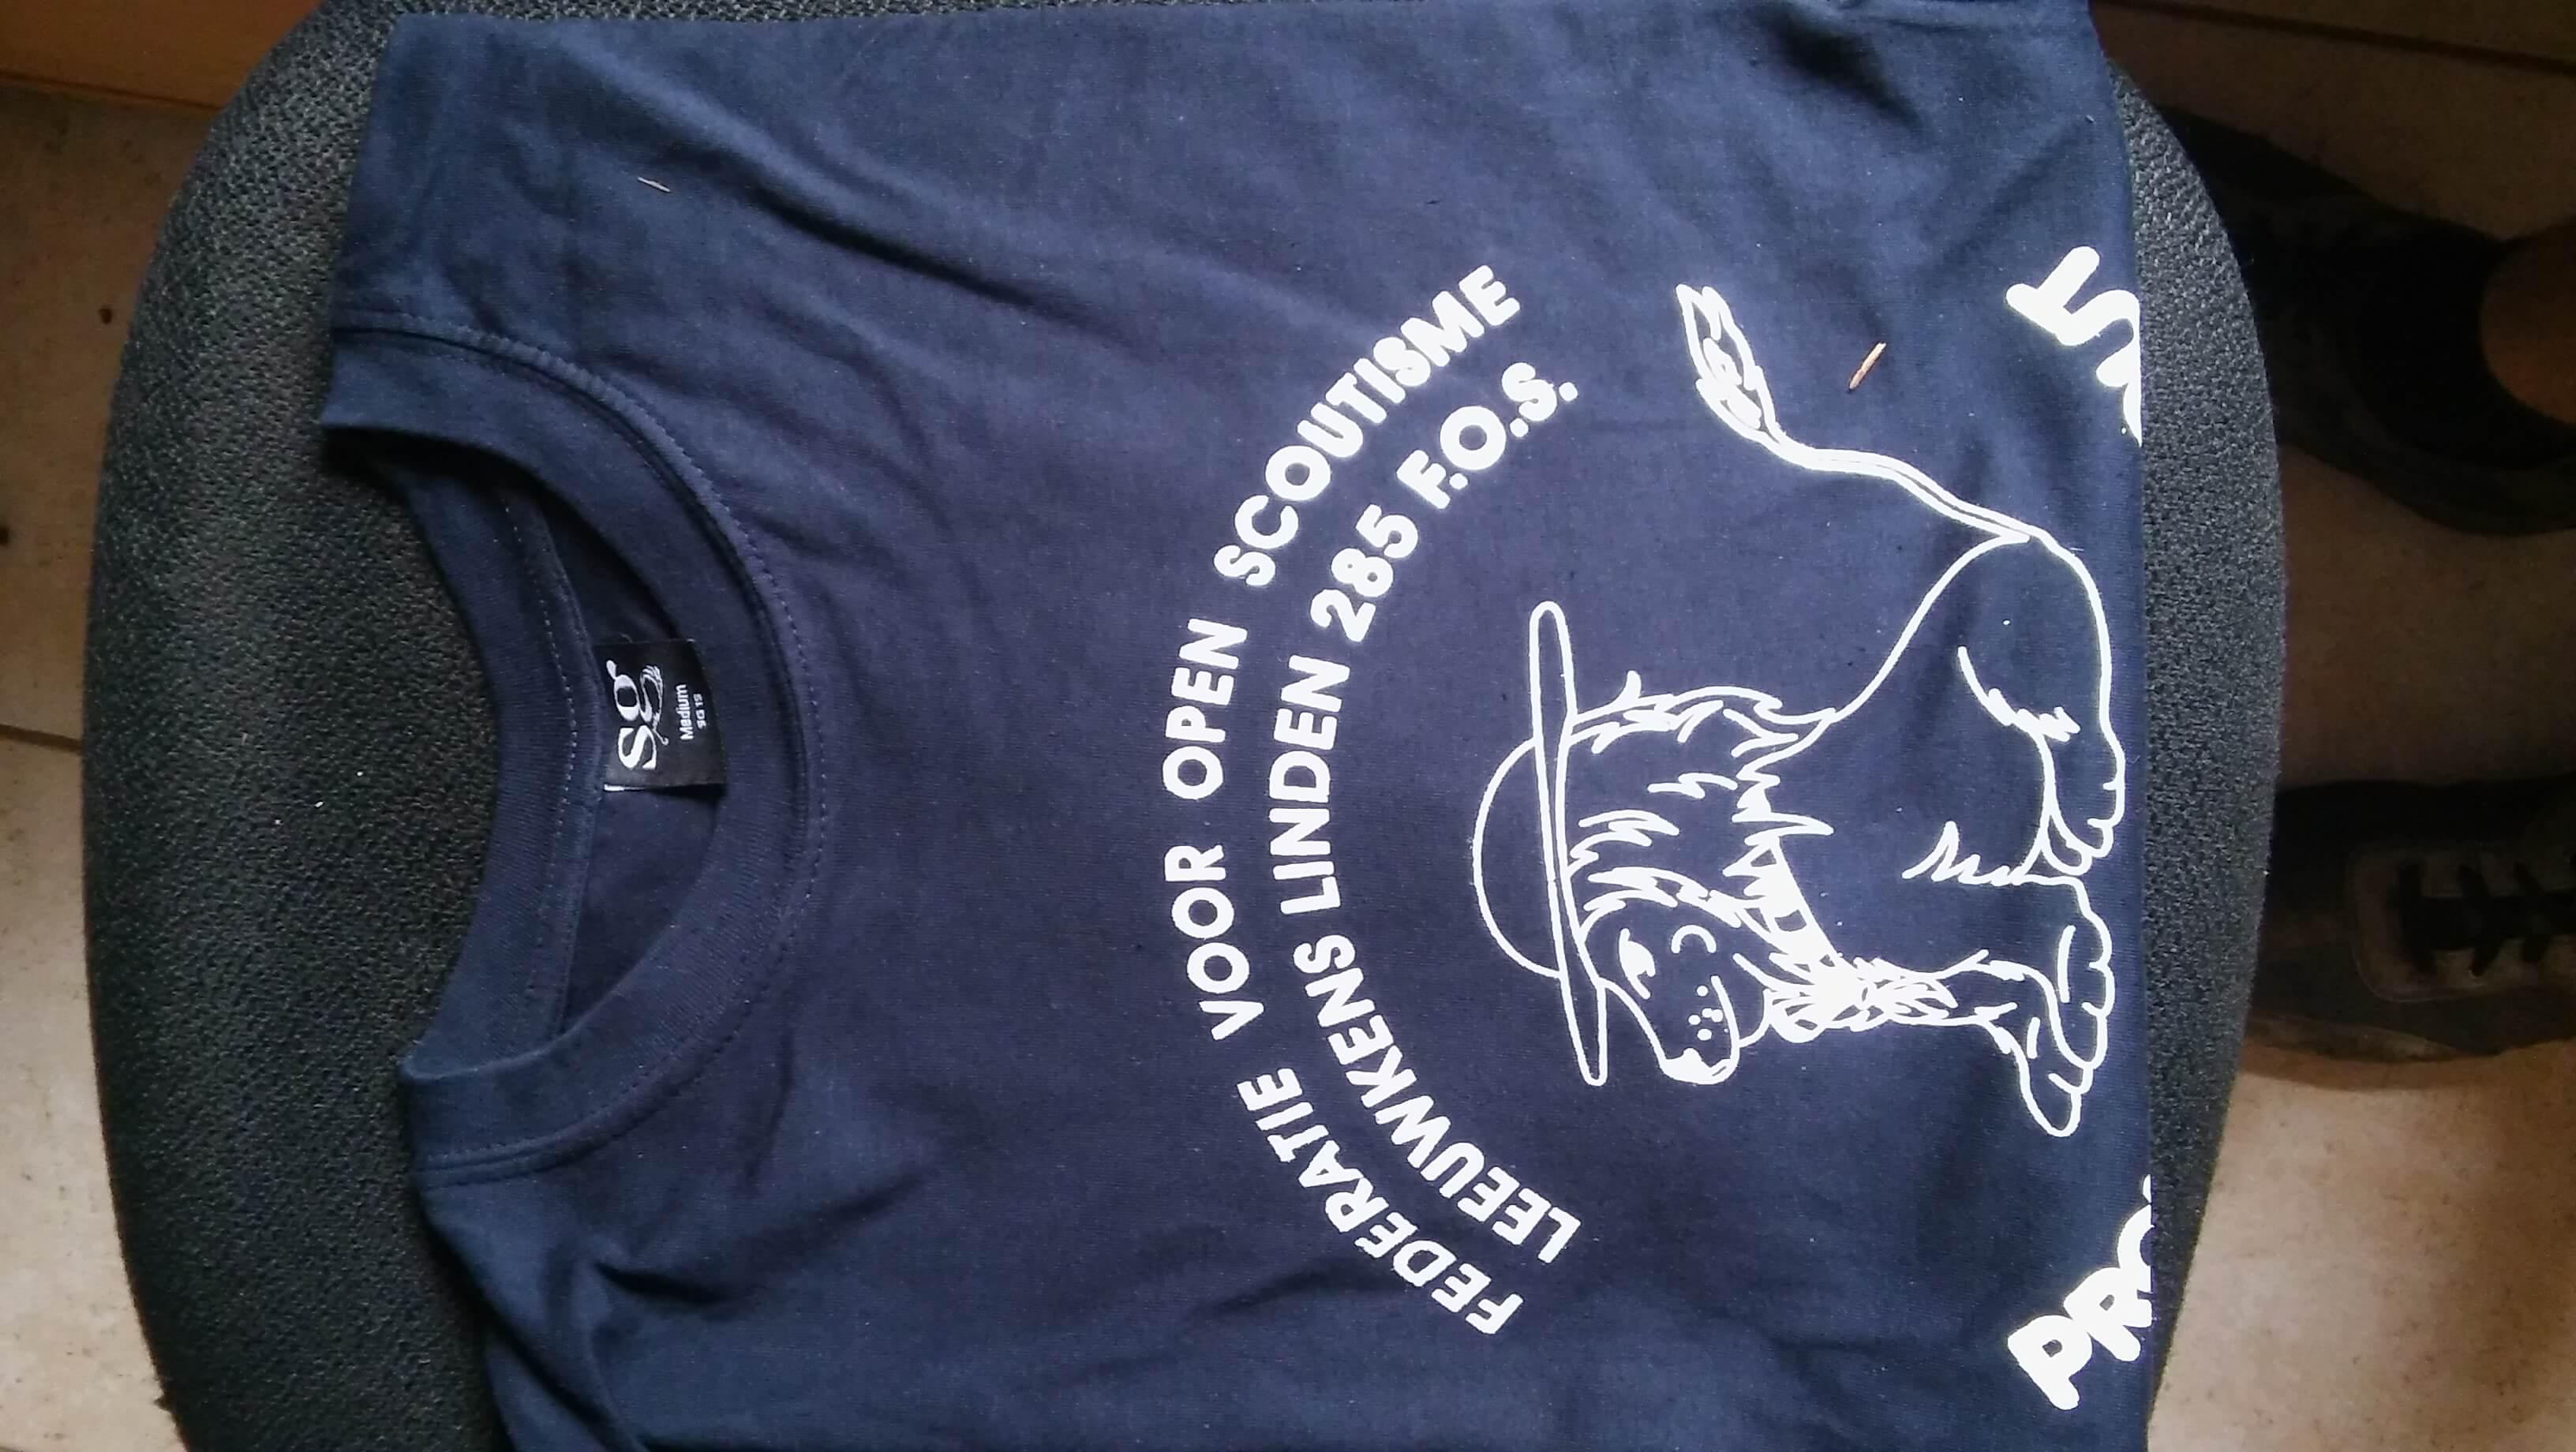 Leeuwkens shirt (oud design) Image